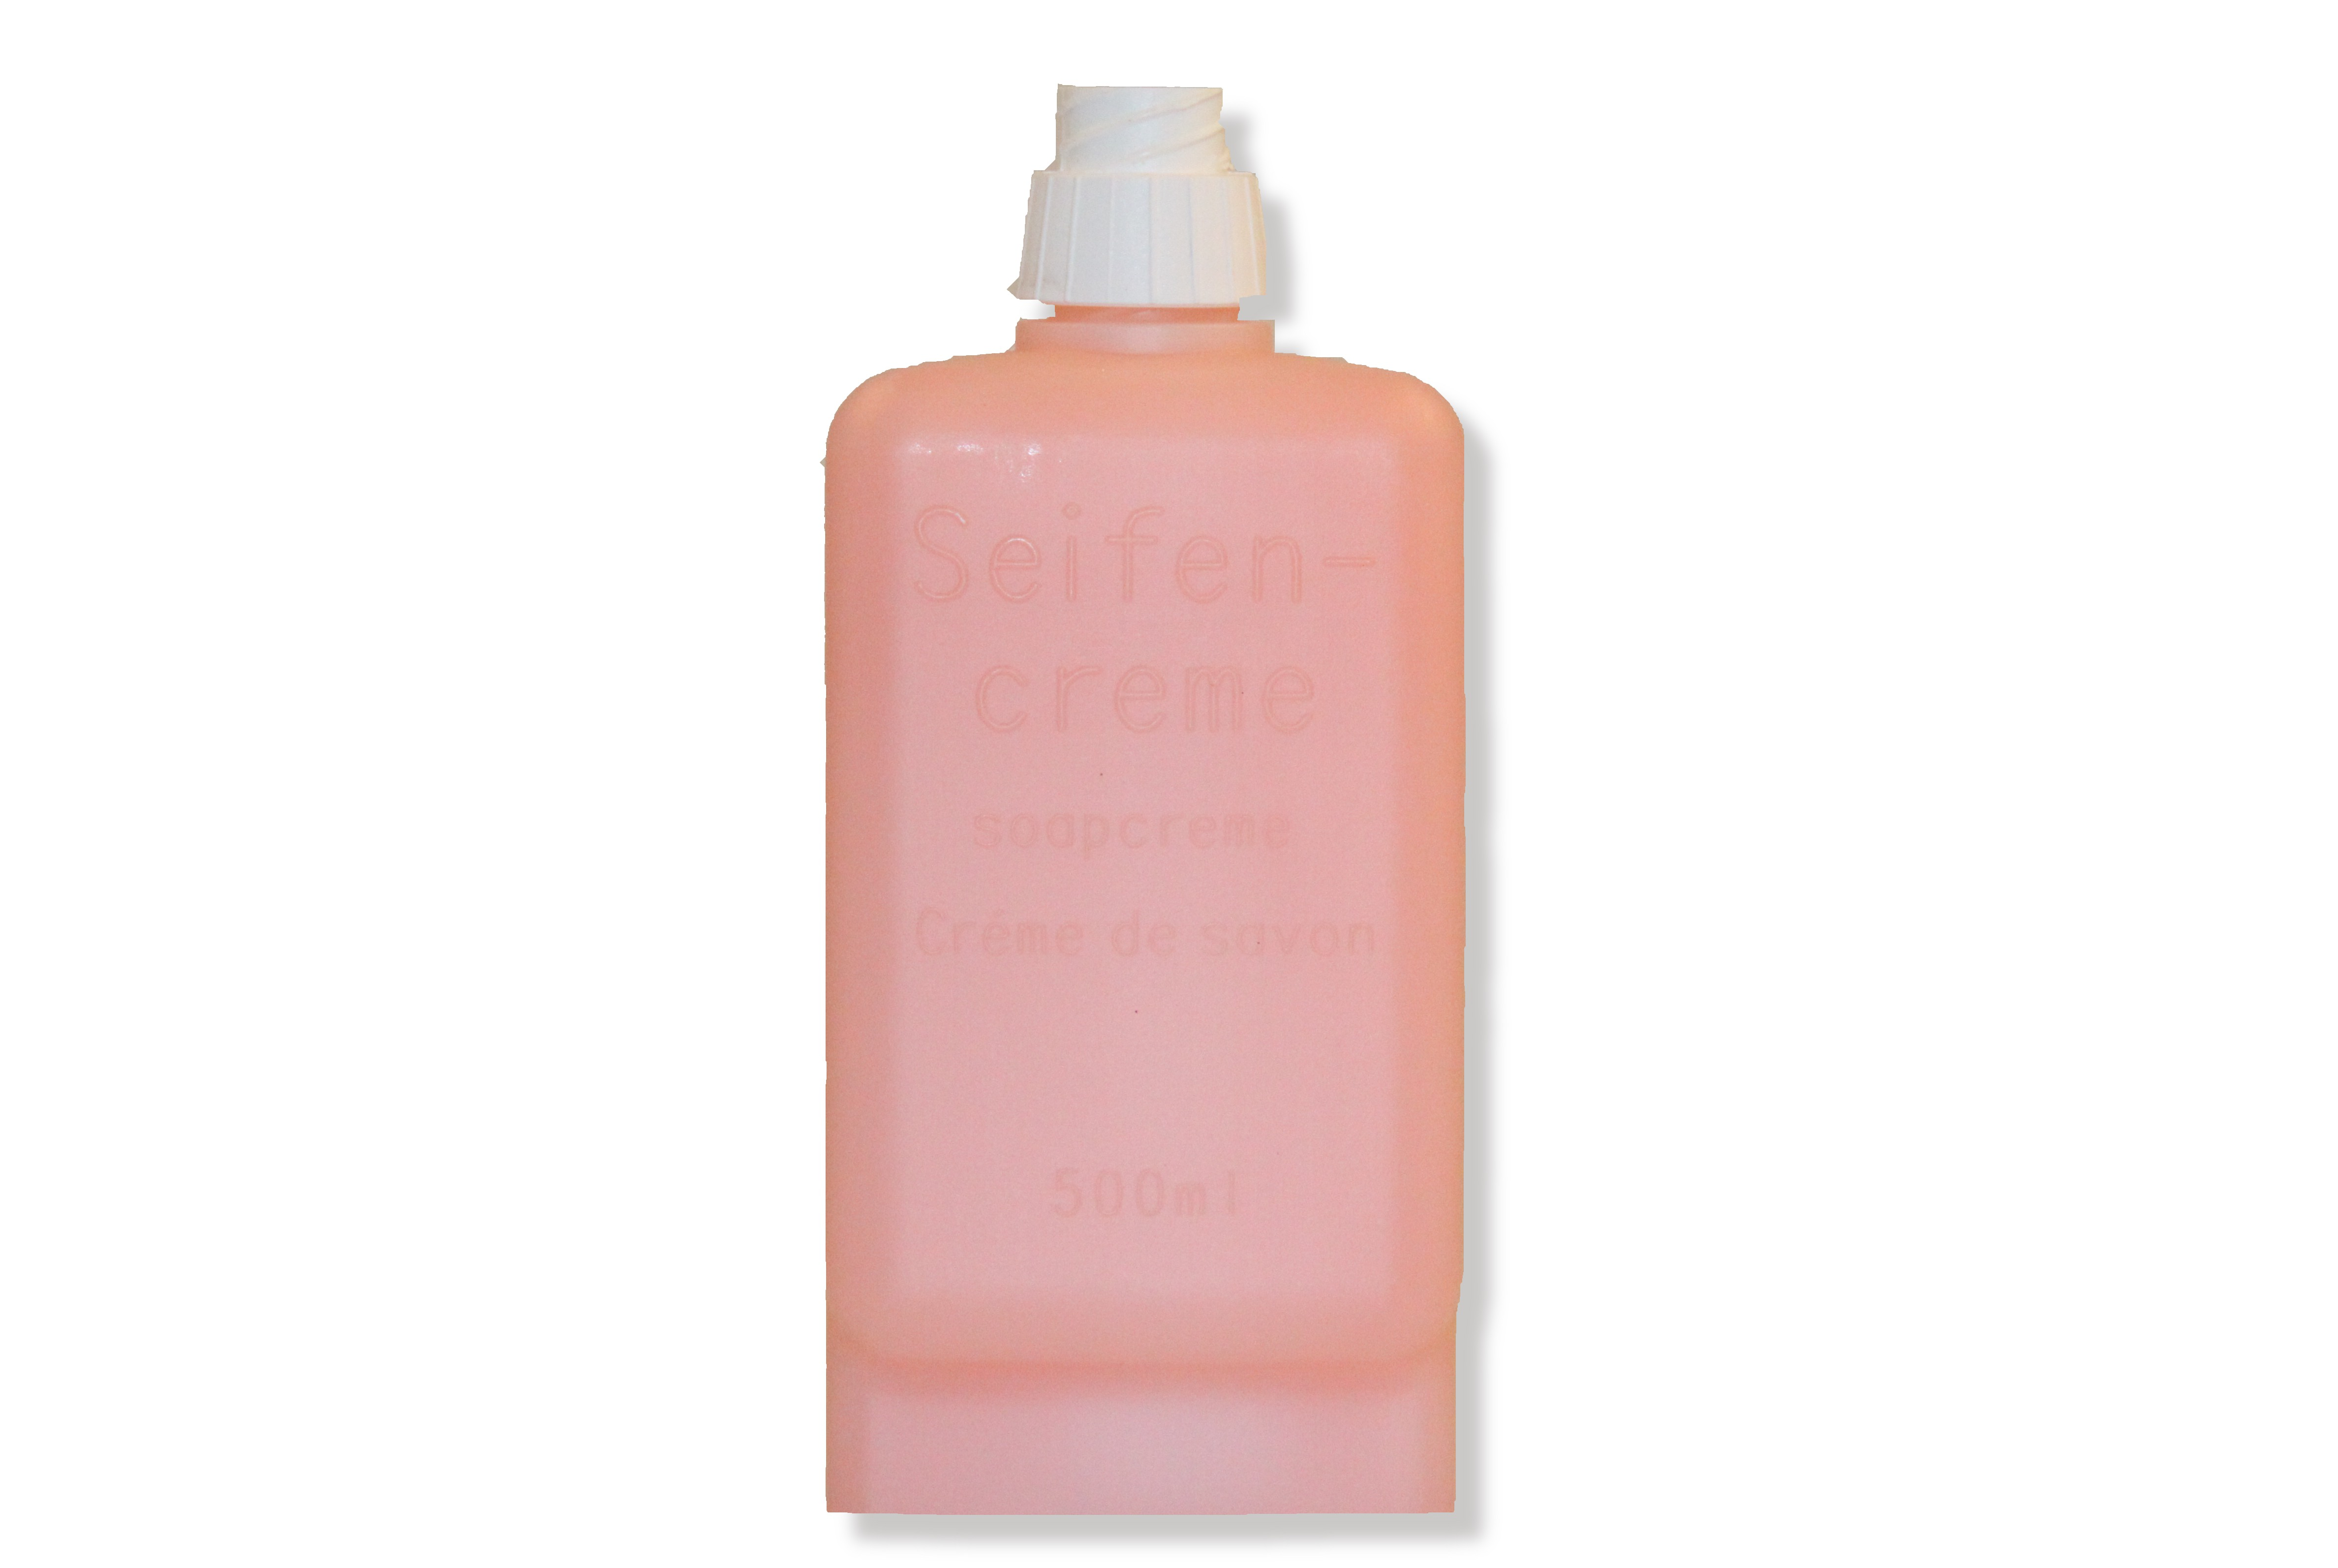 Skintastic Cremeseife Soft rosé, 12 Flaschen/Karton, rosa, 500 ml